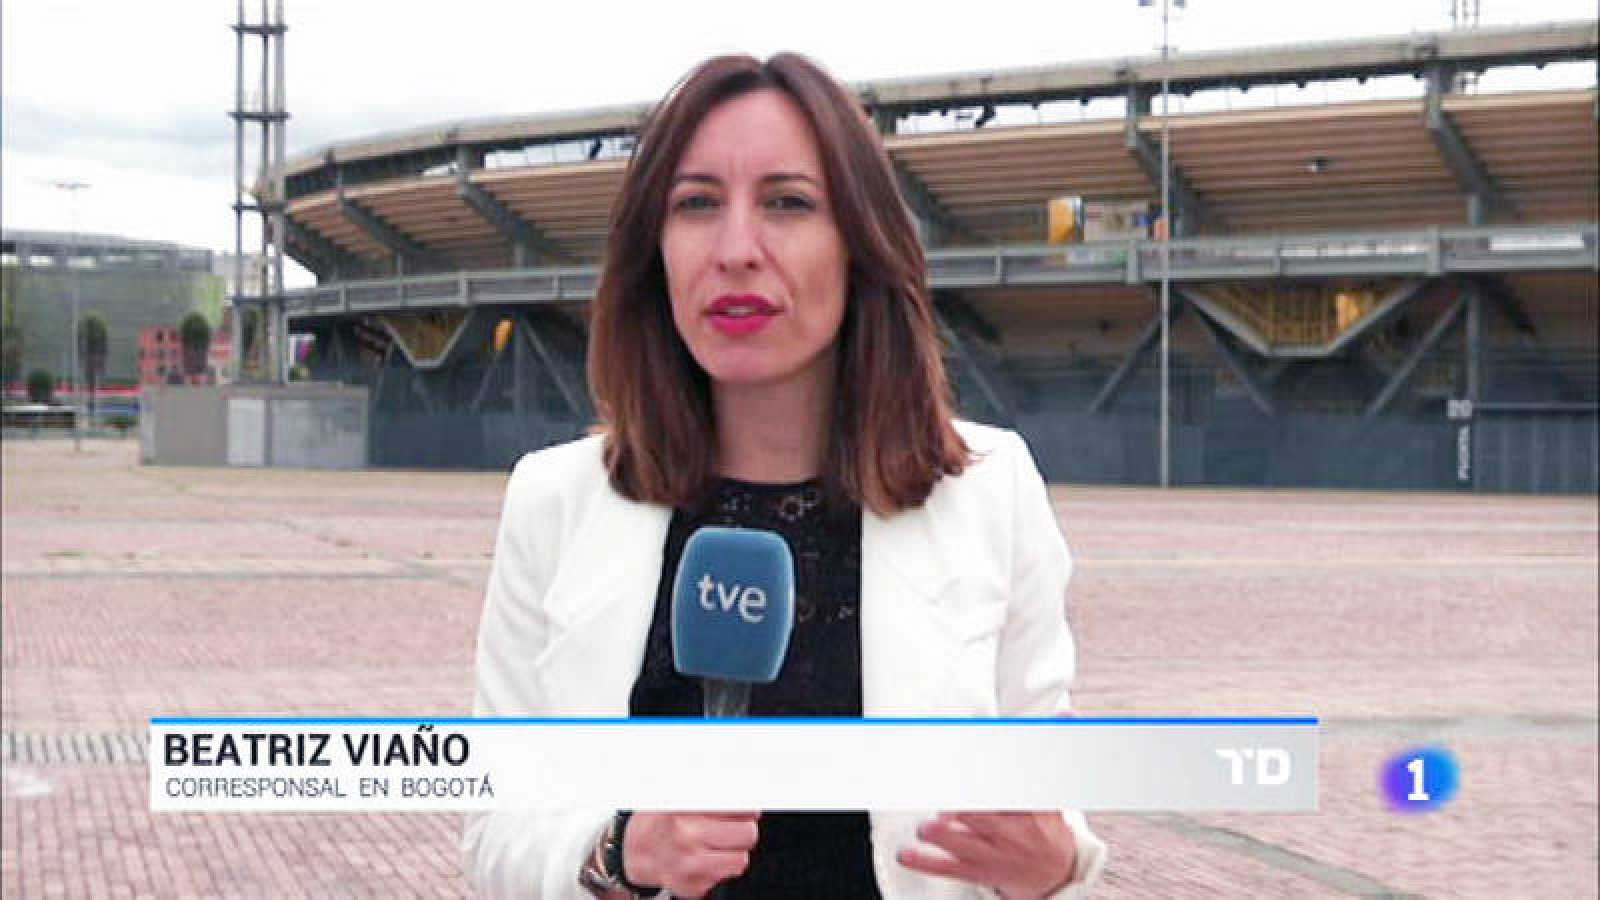 Beatriz Viaño, corresponsal de TVE en Bogotá